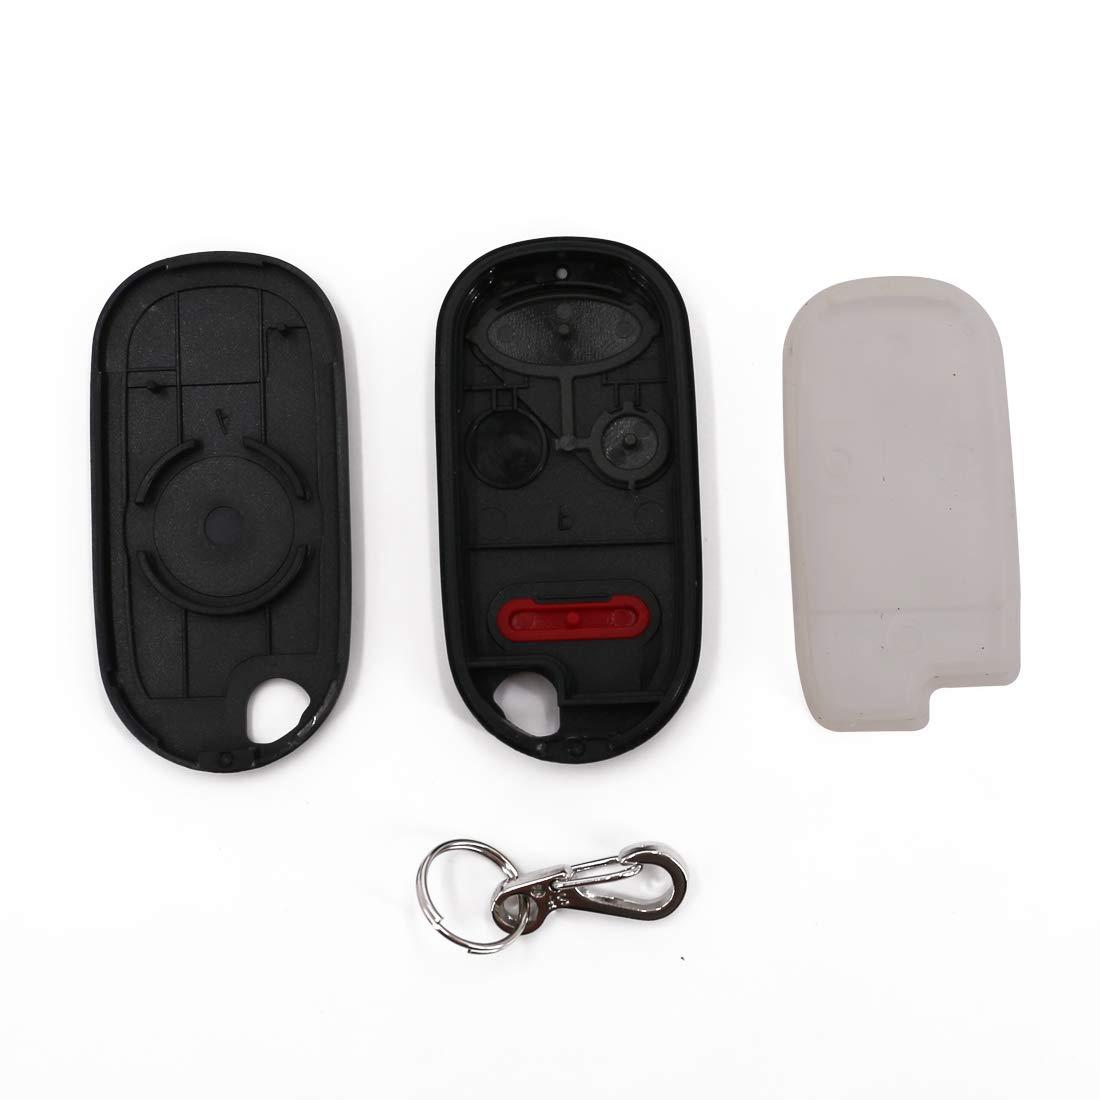 NHVWB1U521, NHVWB1U523 ONLY 2 Pack UTSAUTO Key Fob Shell Cover Keyless Entry Remote Clicker Replacement Keyless Entry Fits For Honda 2003-2008 Element//Honda 2002-2005 Civic Si